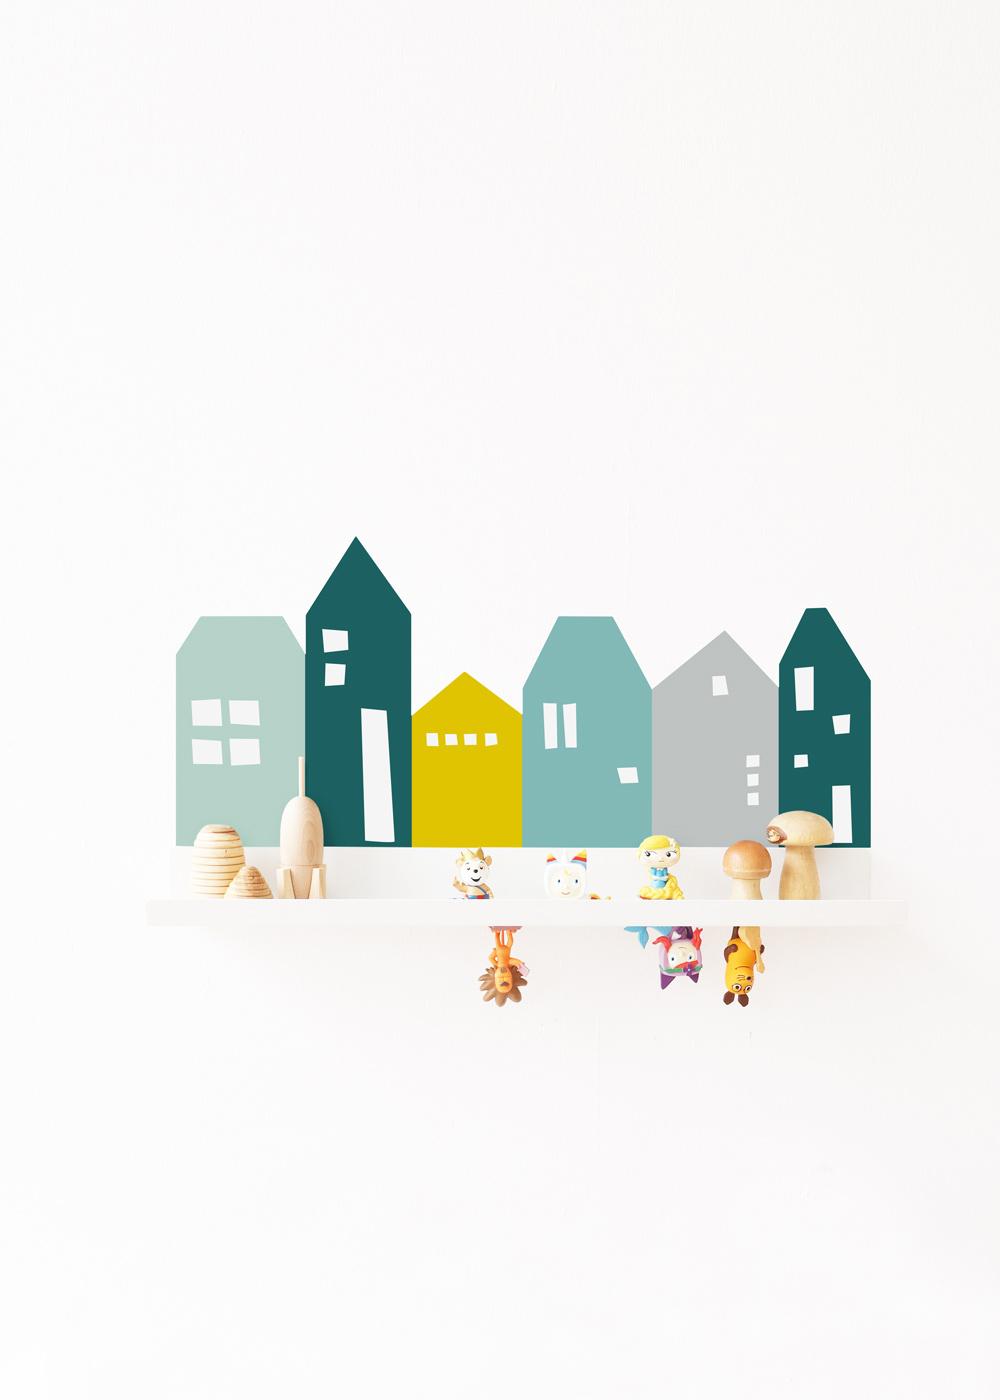 Ikea Malmbäck Bilderleiste Lille Hus Mint Waldgrün Gesamtansicht